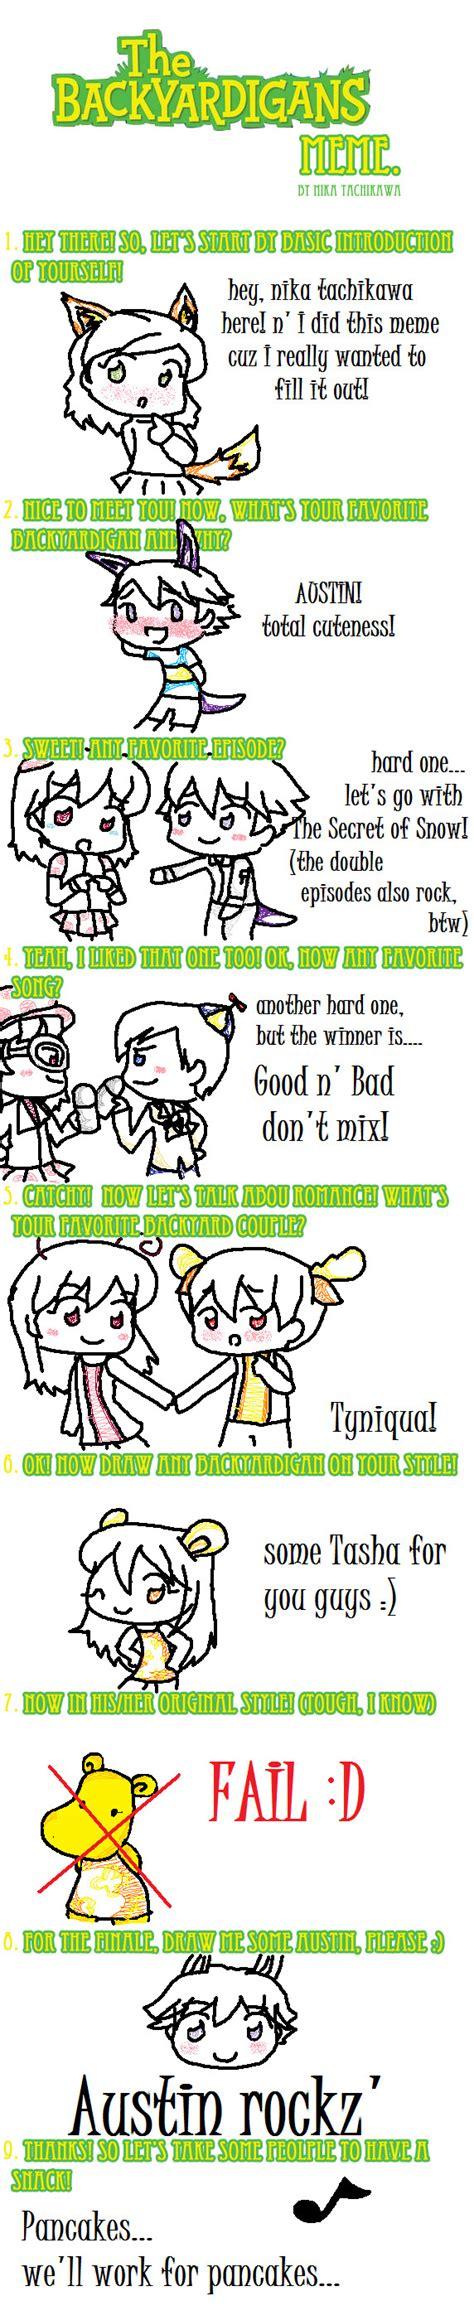 backyardigans meme filled by tachikawa on deviantart